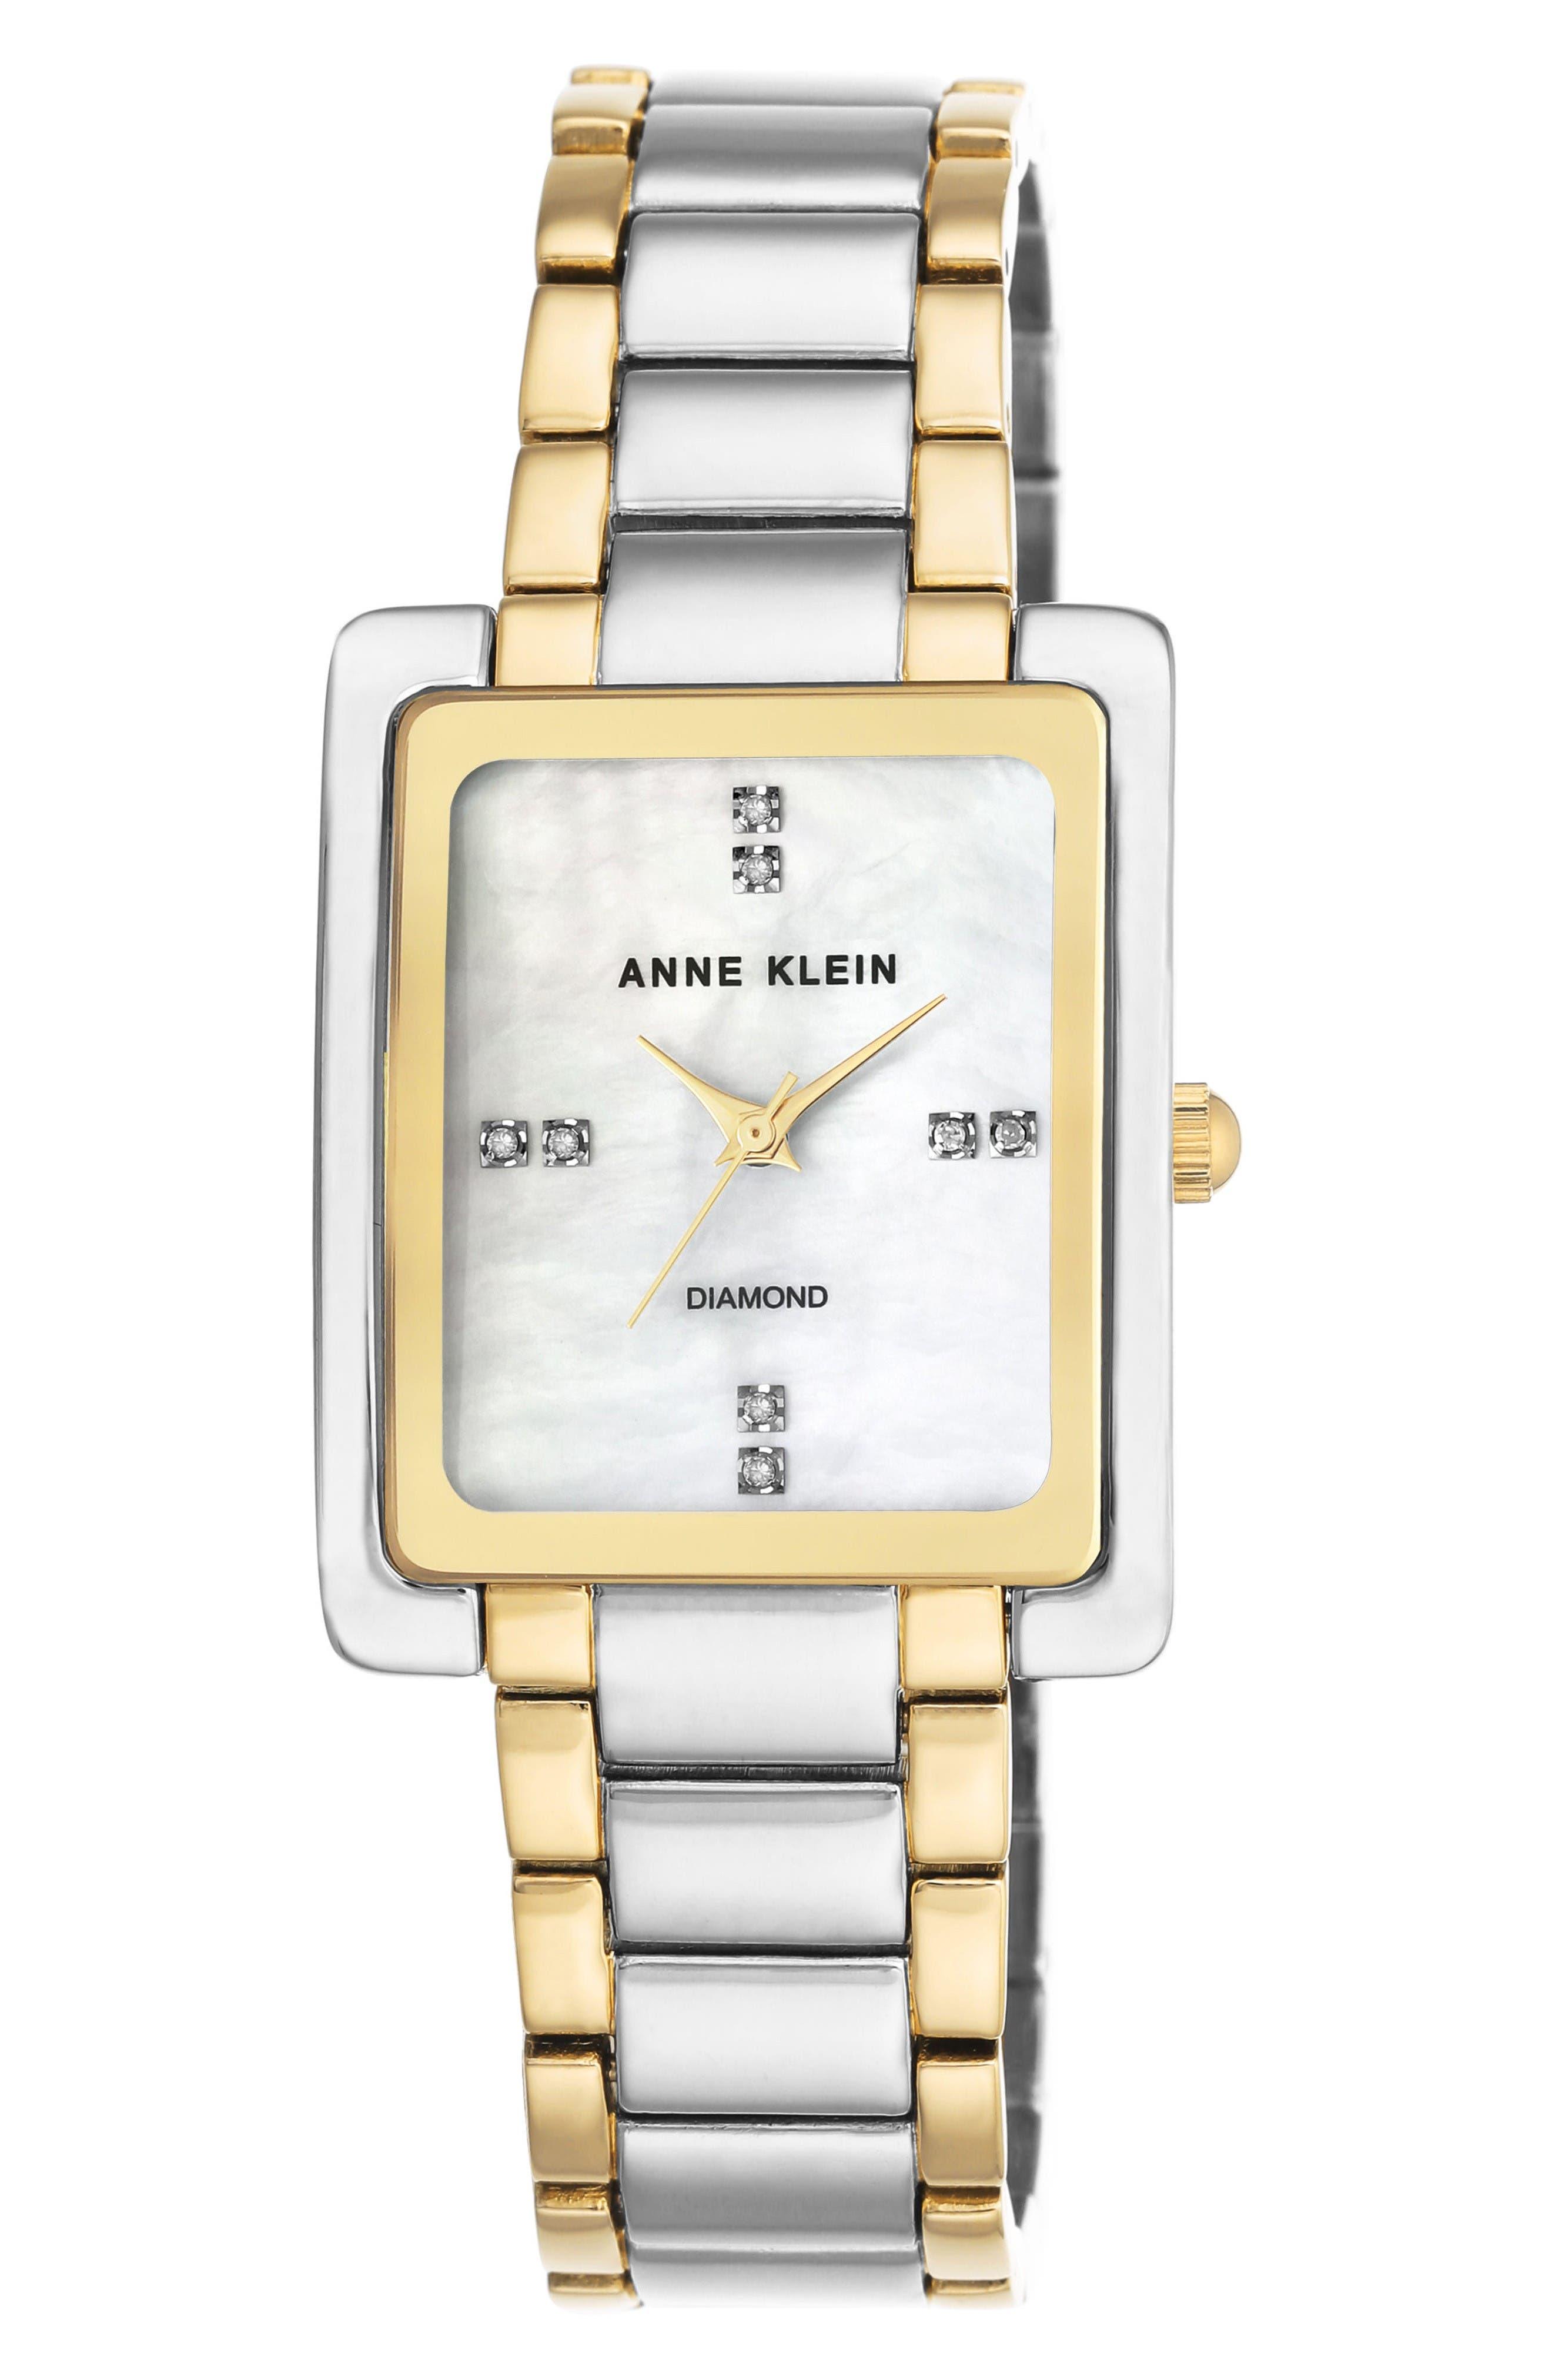 Anne Klein Diamond Bracelet Watch, 28mm x 35mm